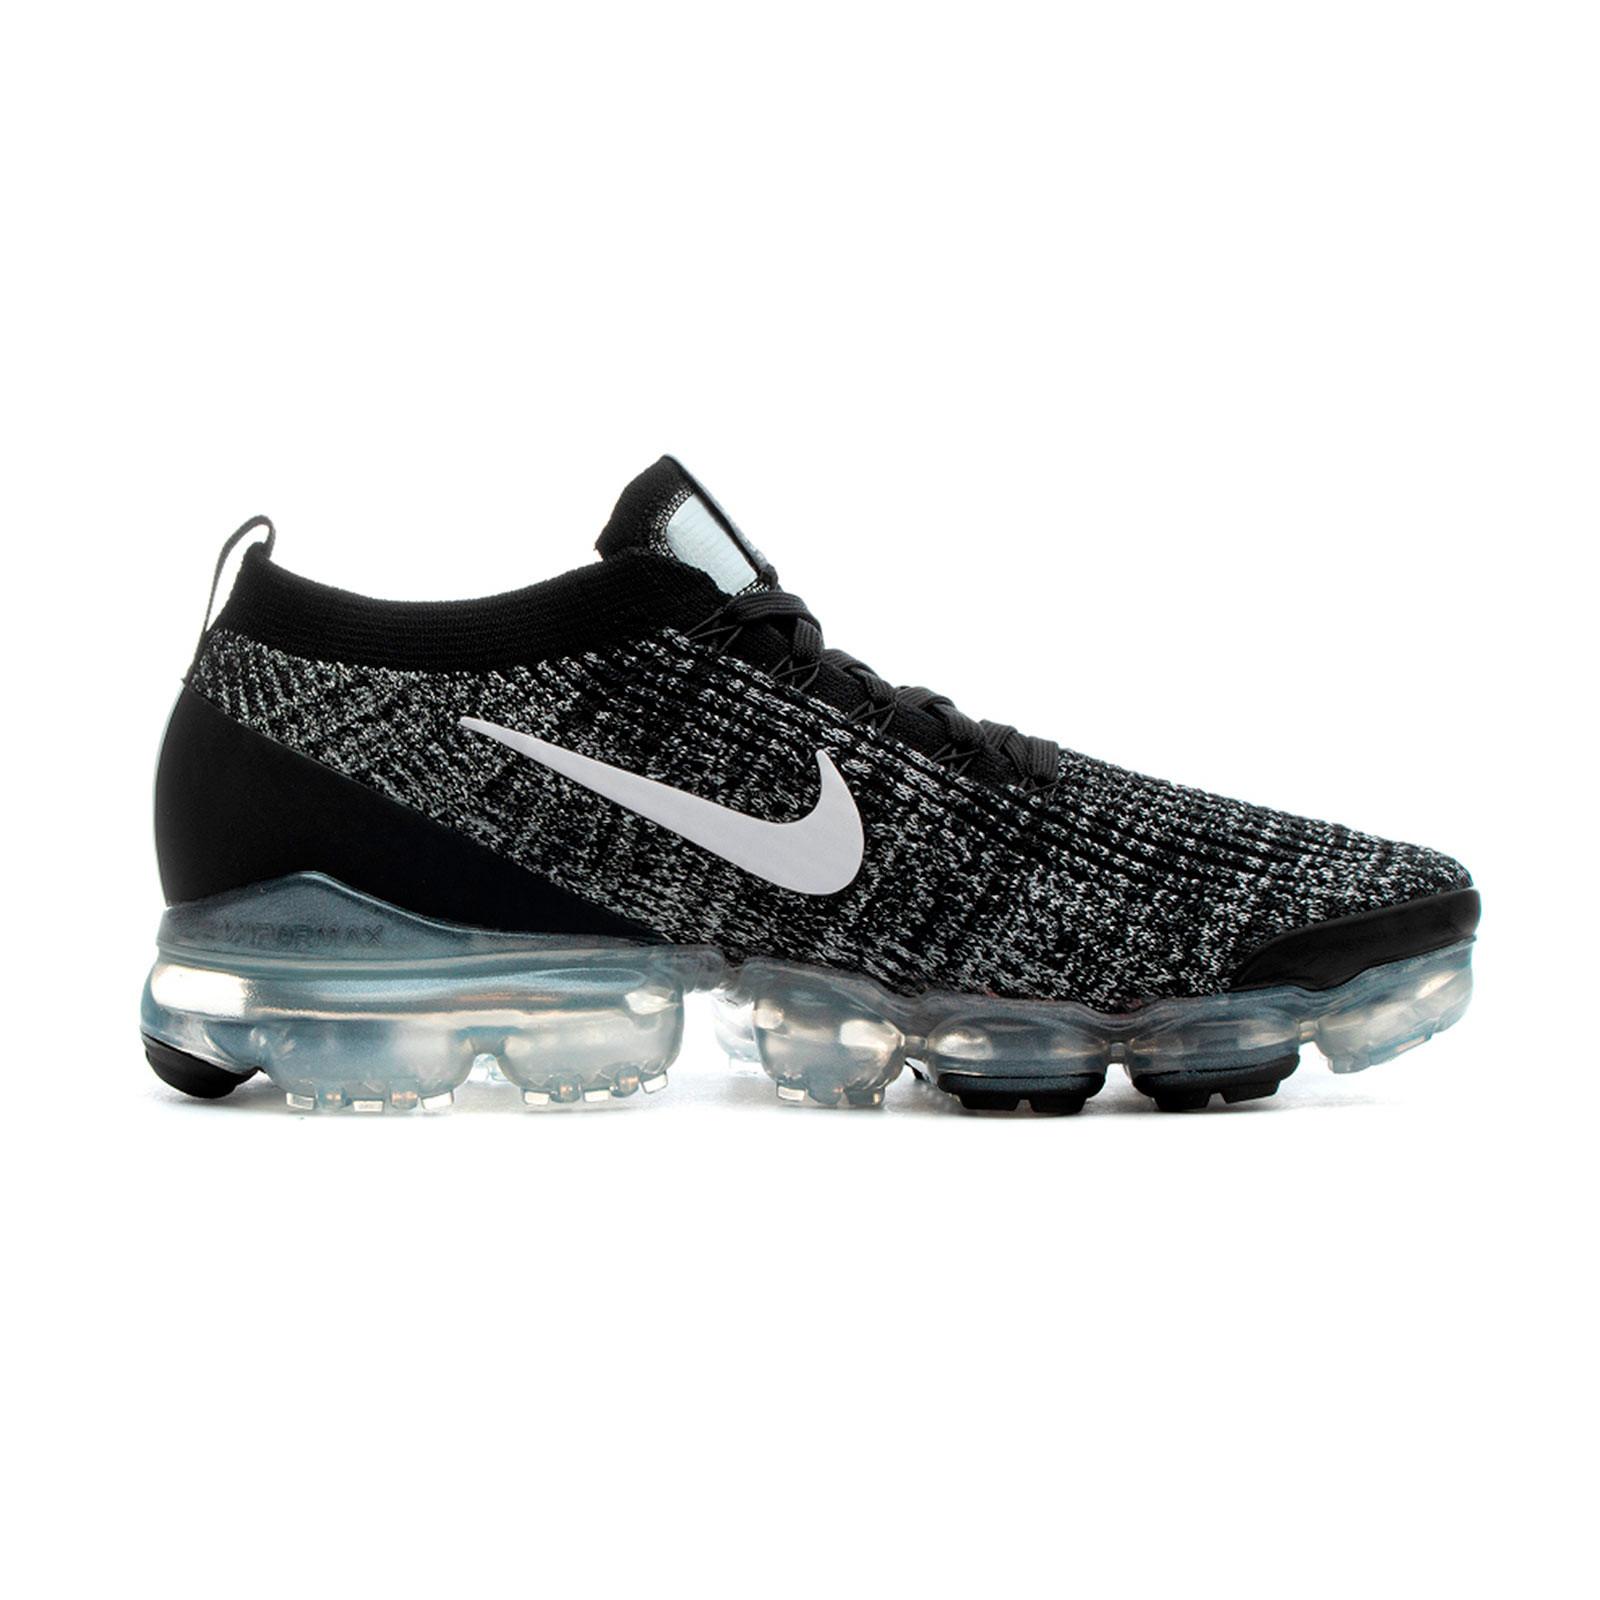 Zapatillas Nike Air Vapormax Flyknit 3 Sportswear para Hombre